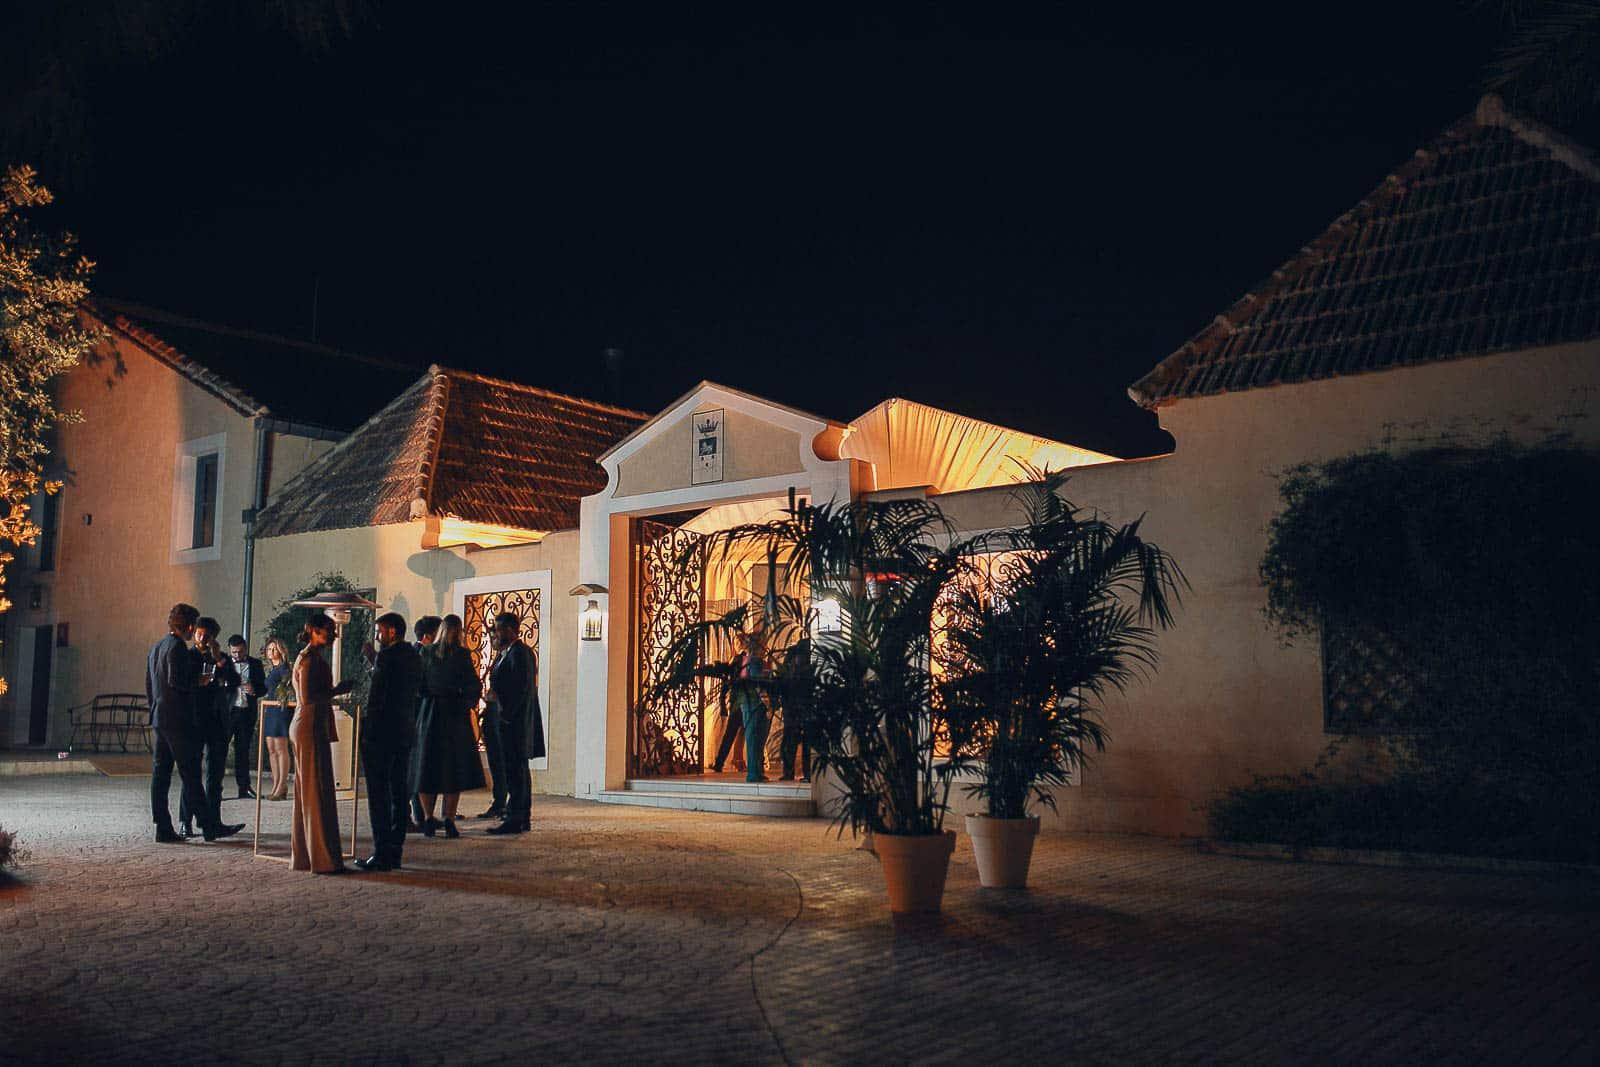 boda restaurante luces noche marquesa recepcion